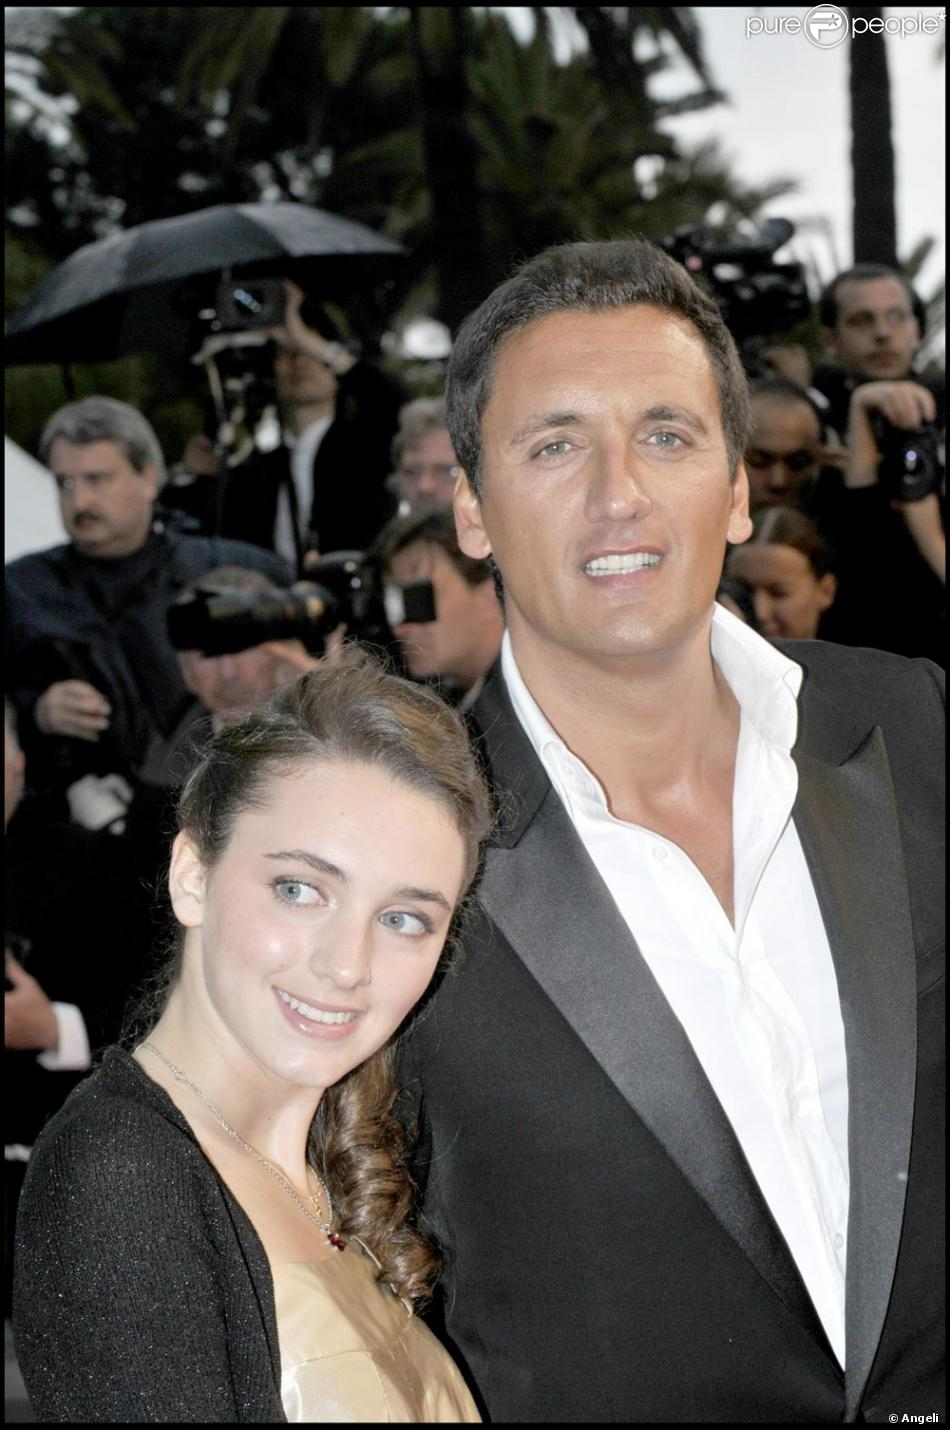 Dany brillant et sa fille leah purepeople for Dans brillant